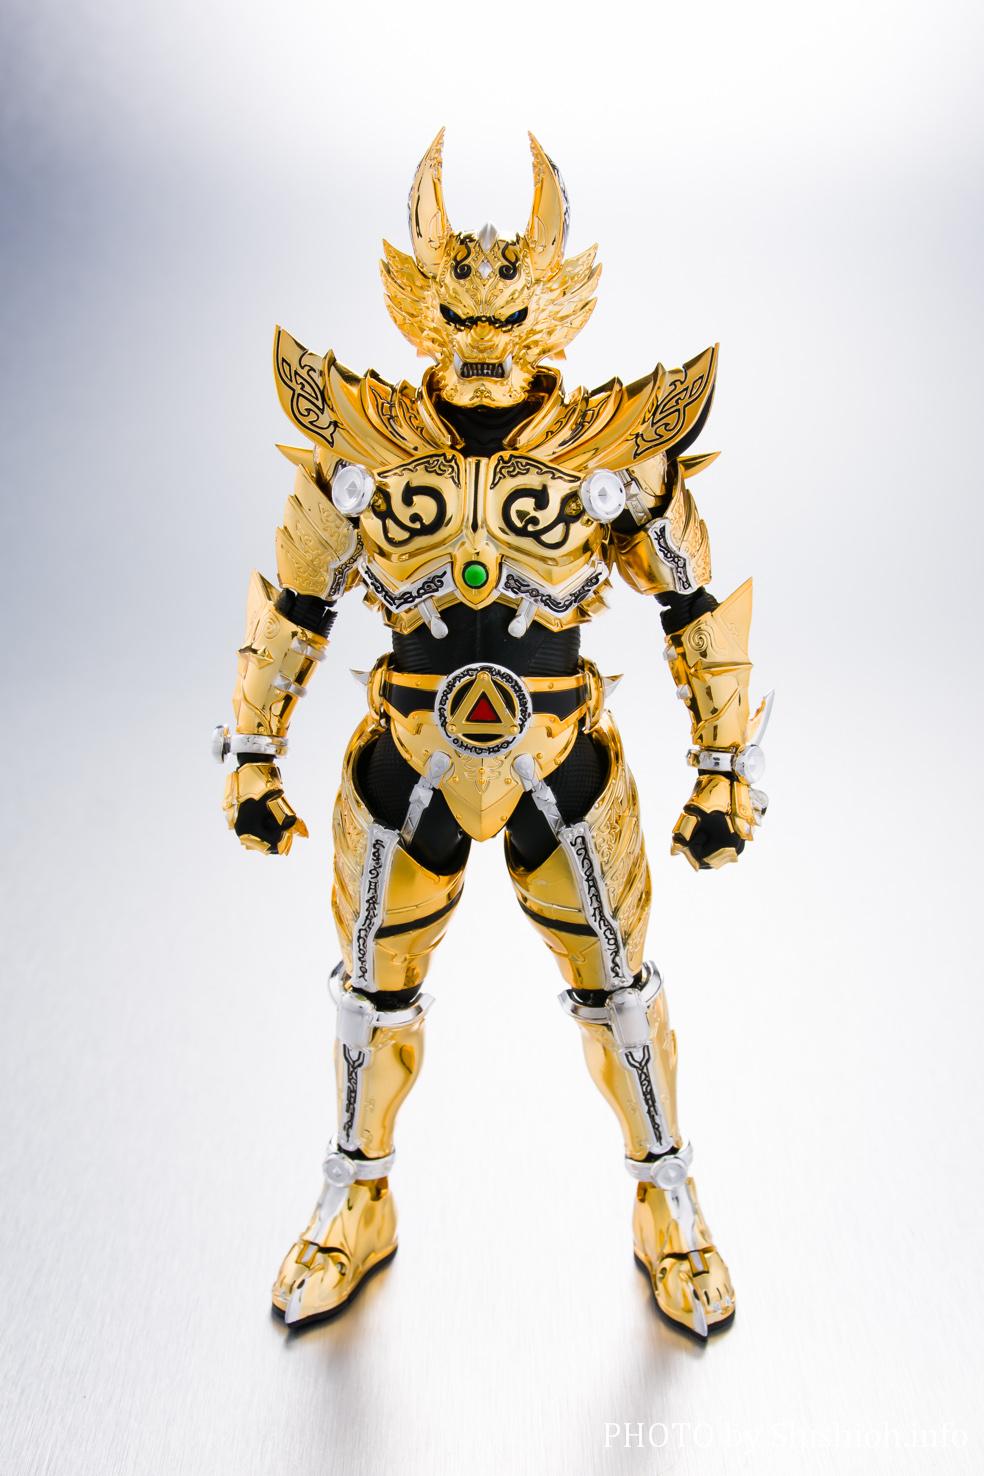 S.H.Figuarts(真骨彫製法) 黄金騎士ガロ(冴島雷牙)